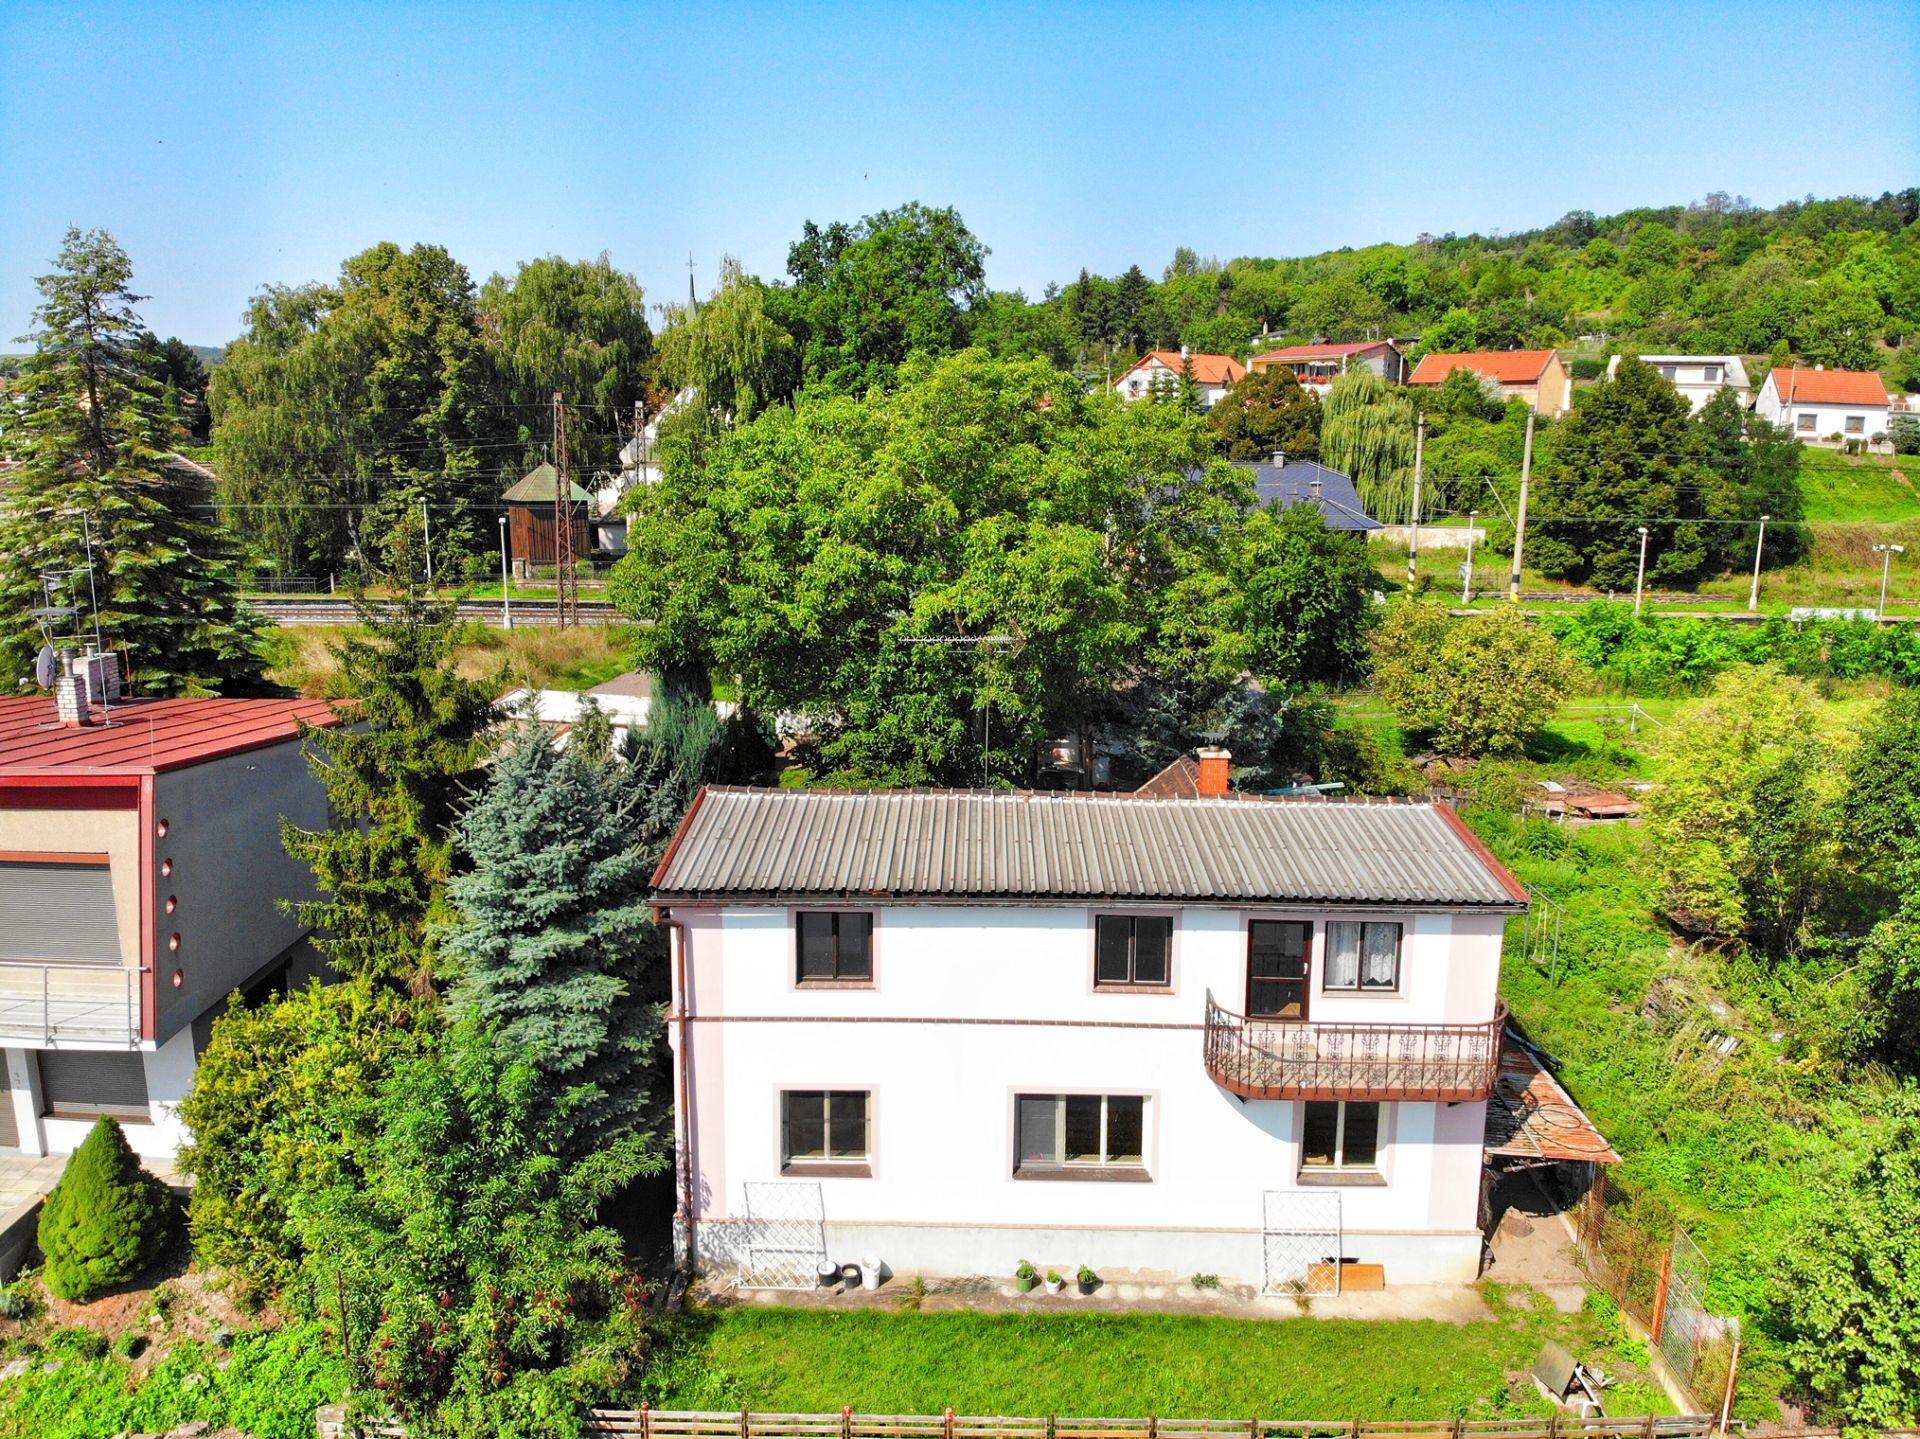 Prodej krásného rodinného domu u Vltavy v Nelahozevsi